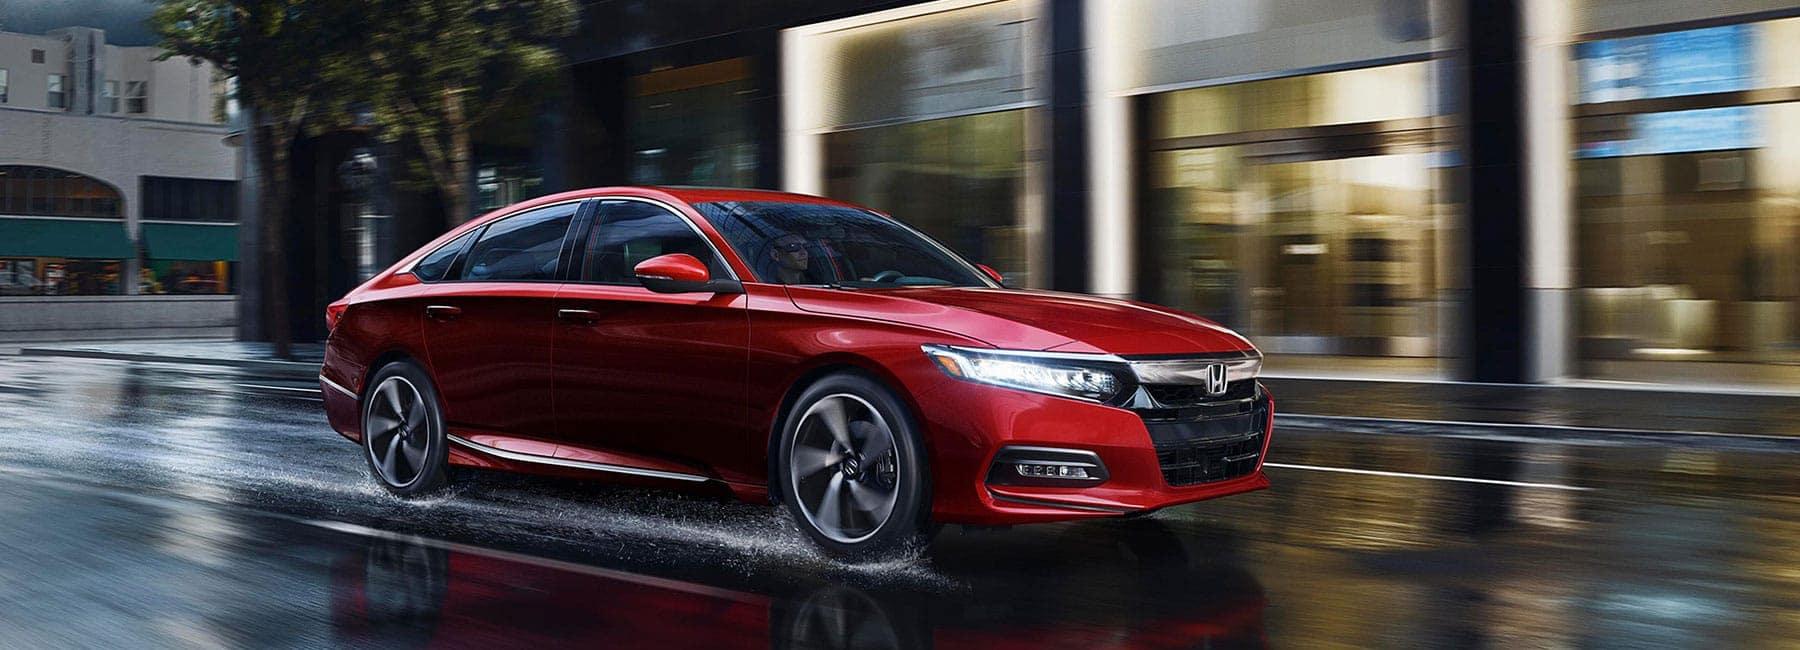 2019 Honda Accord speeds through wet city street